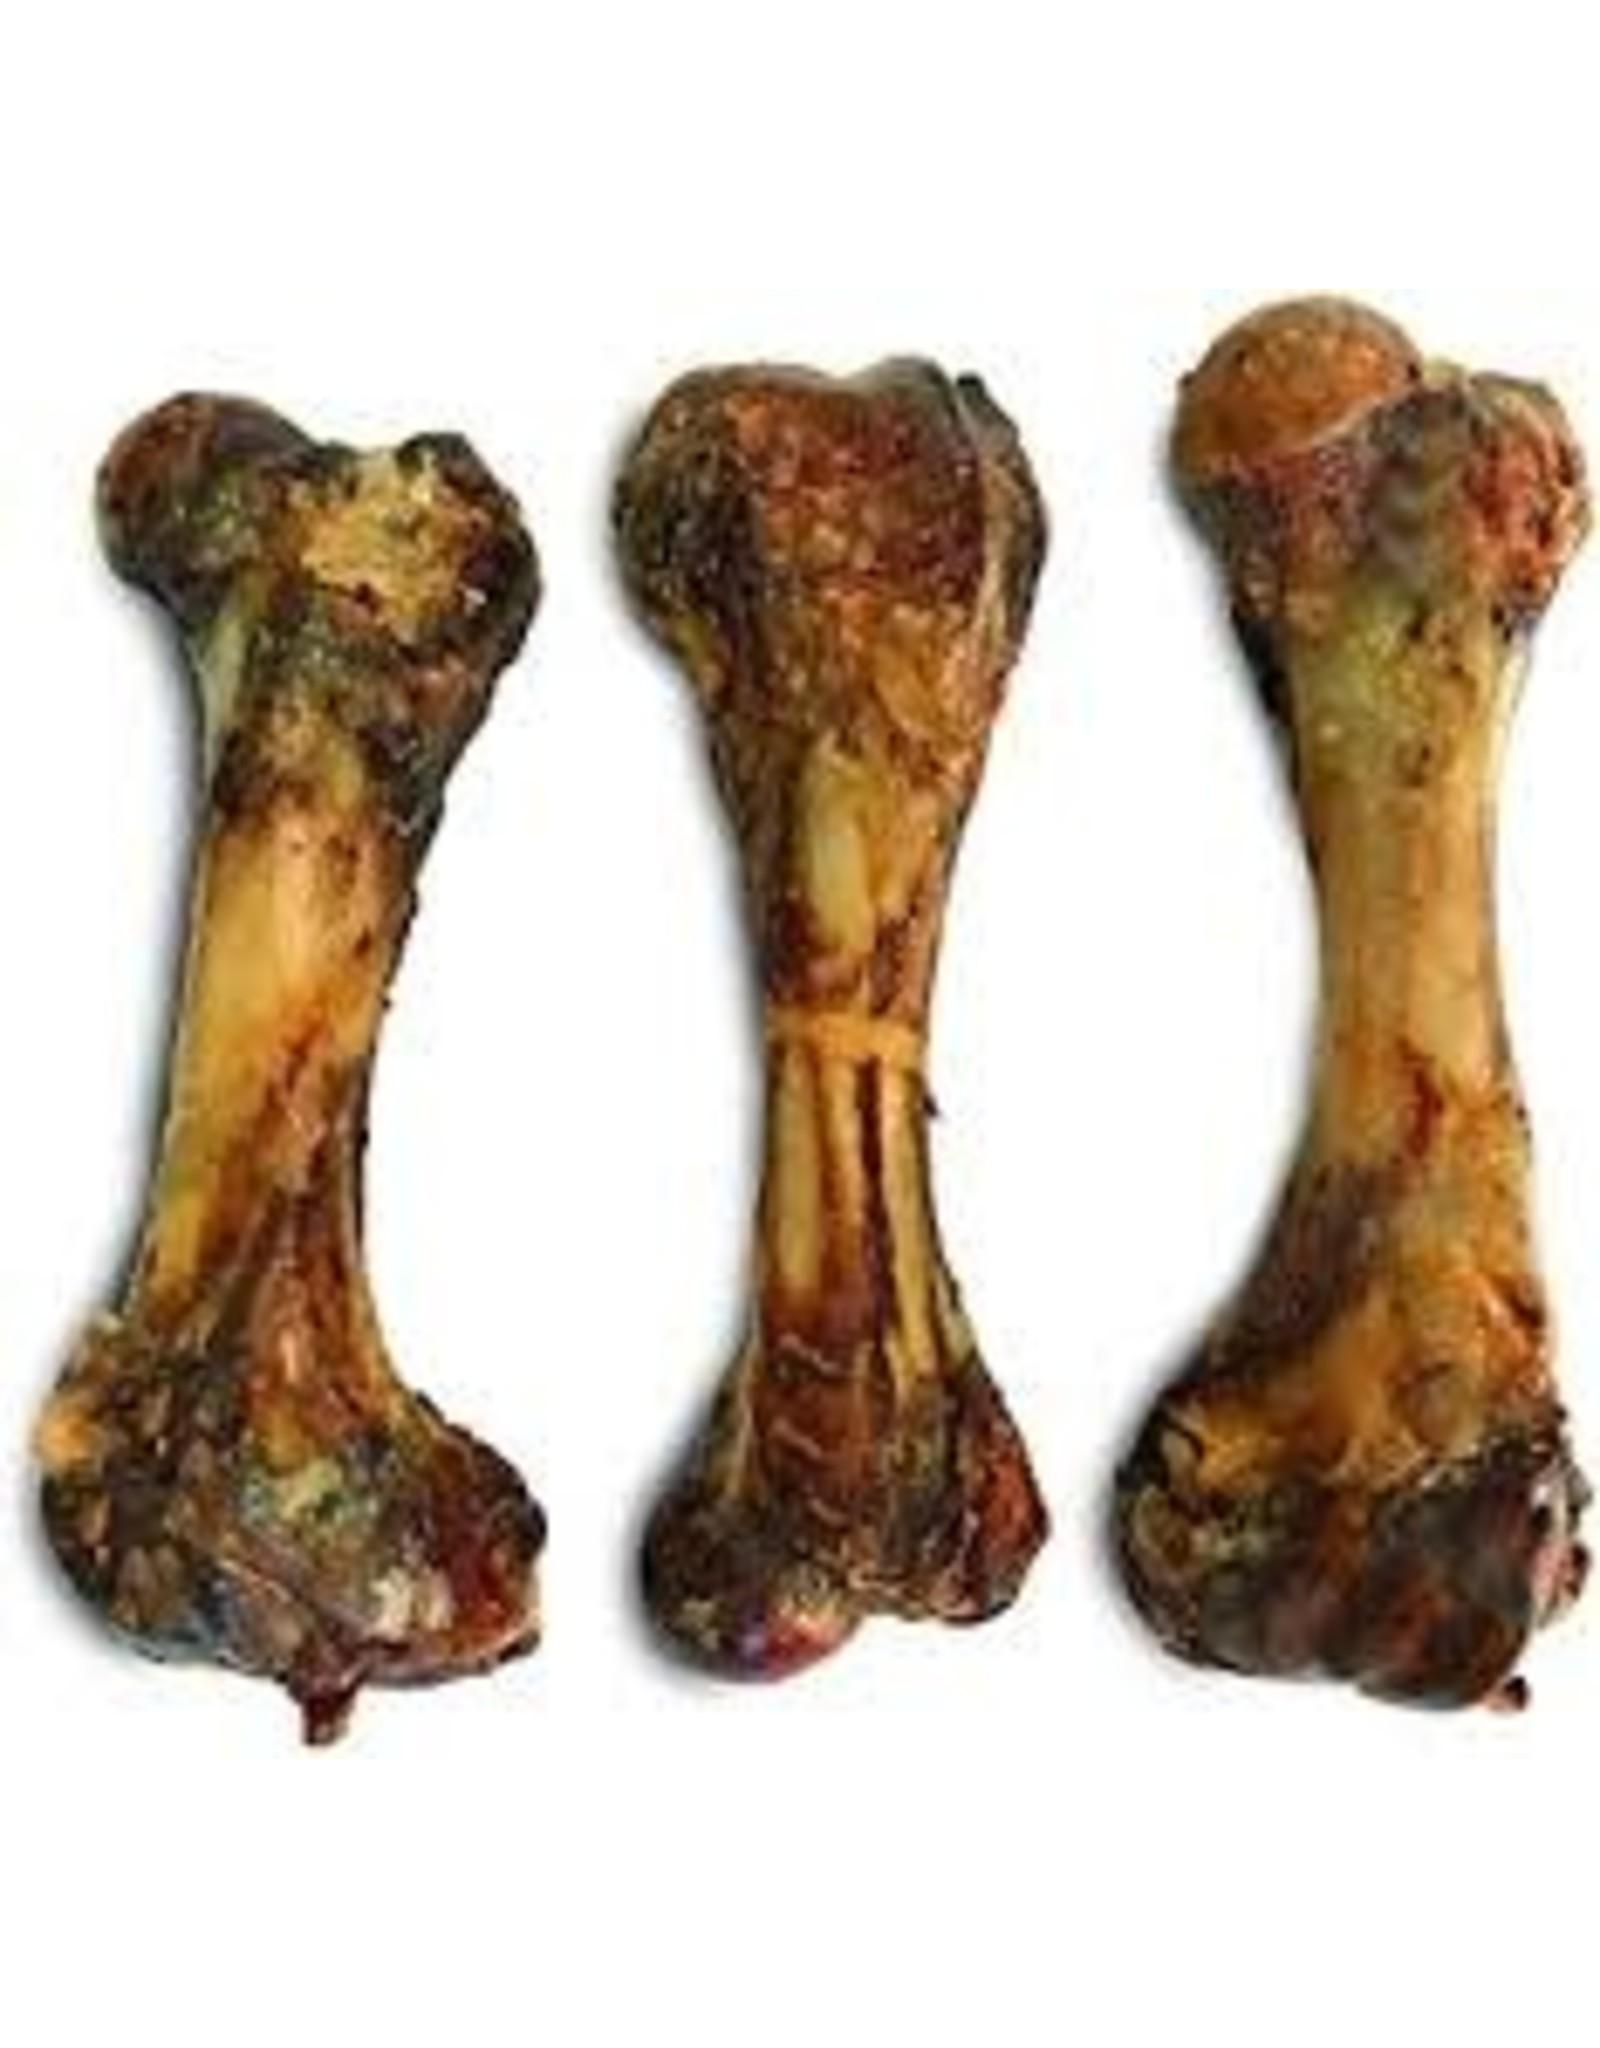 Jack & Pup Jack & Pup Shin Bone: 11 inch